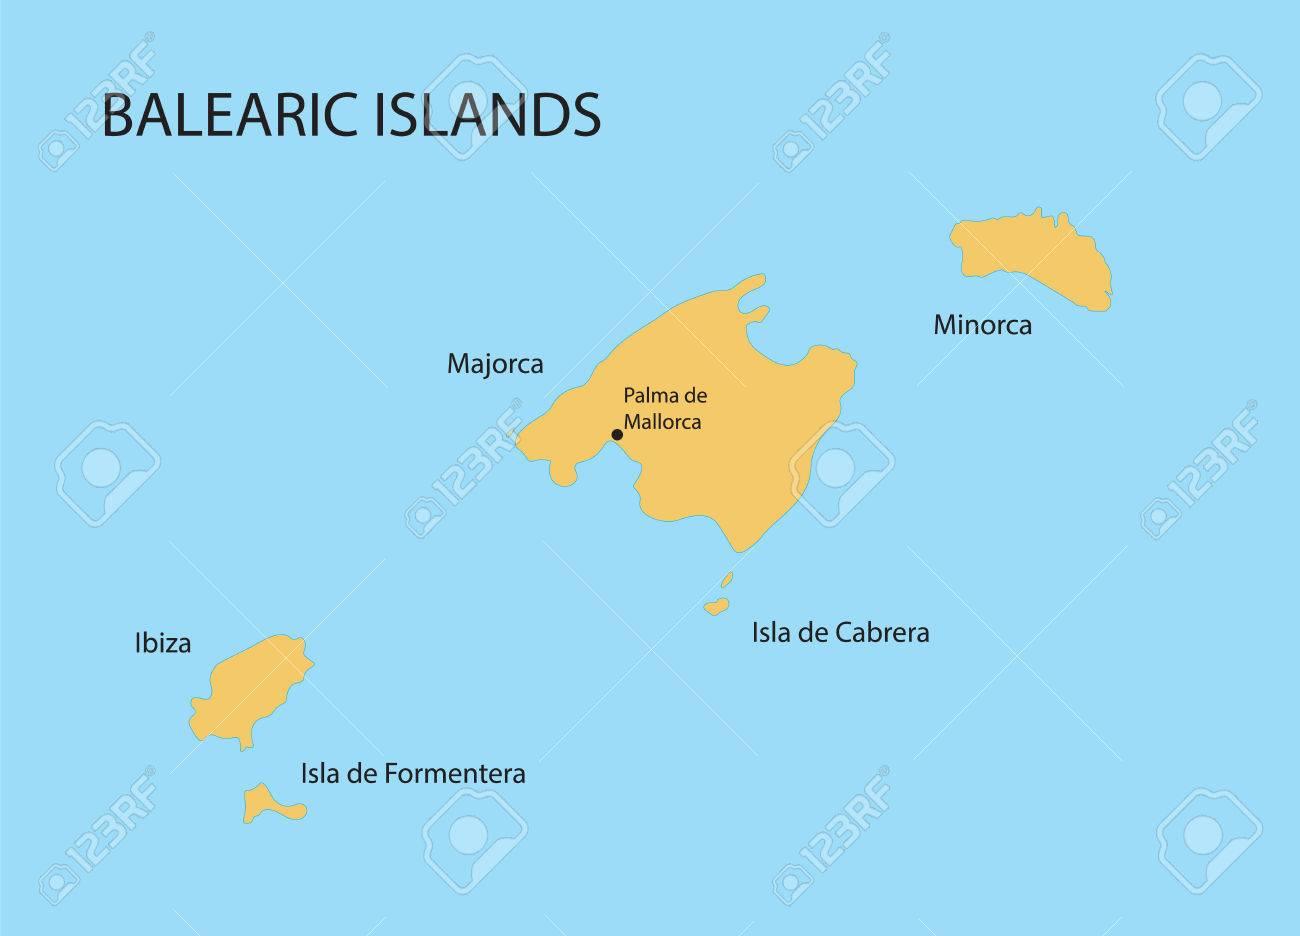 Isla De Cabrera Mapa.Islas Baleares Mapa Con Indicacion De Palma De Mallorca